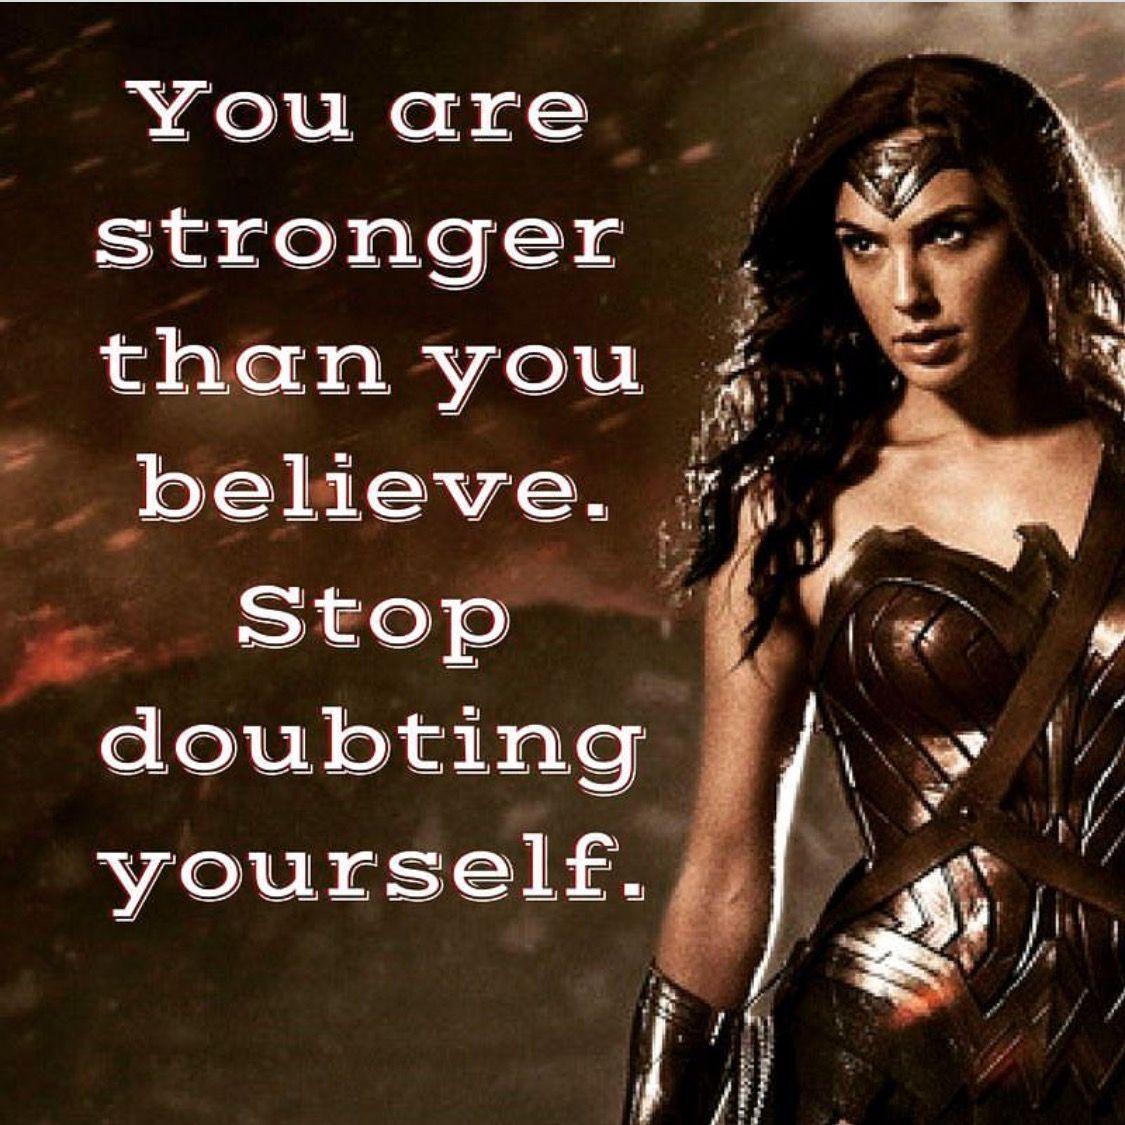 Quotes Strength Wonderwoman Wonder Woman Quotes Superhero Quotes Woman Quotes